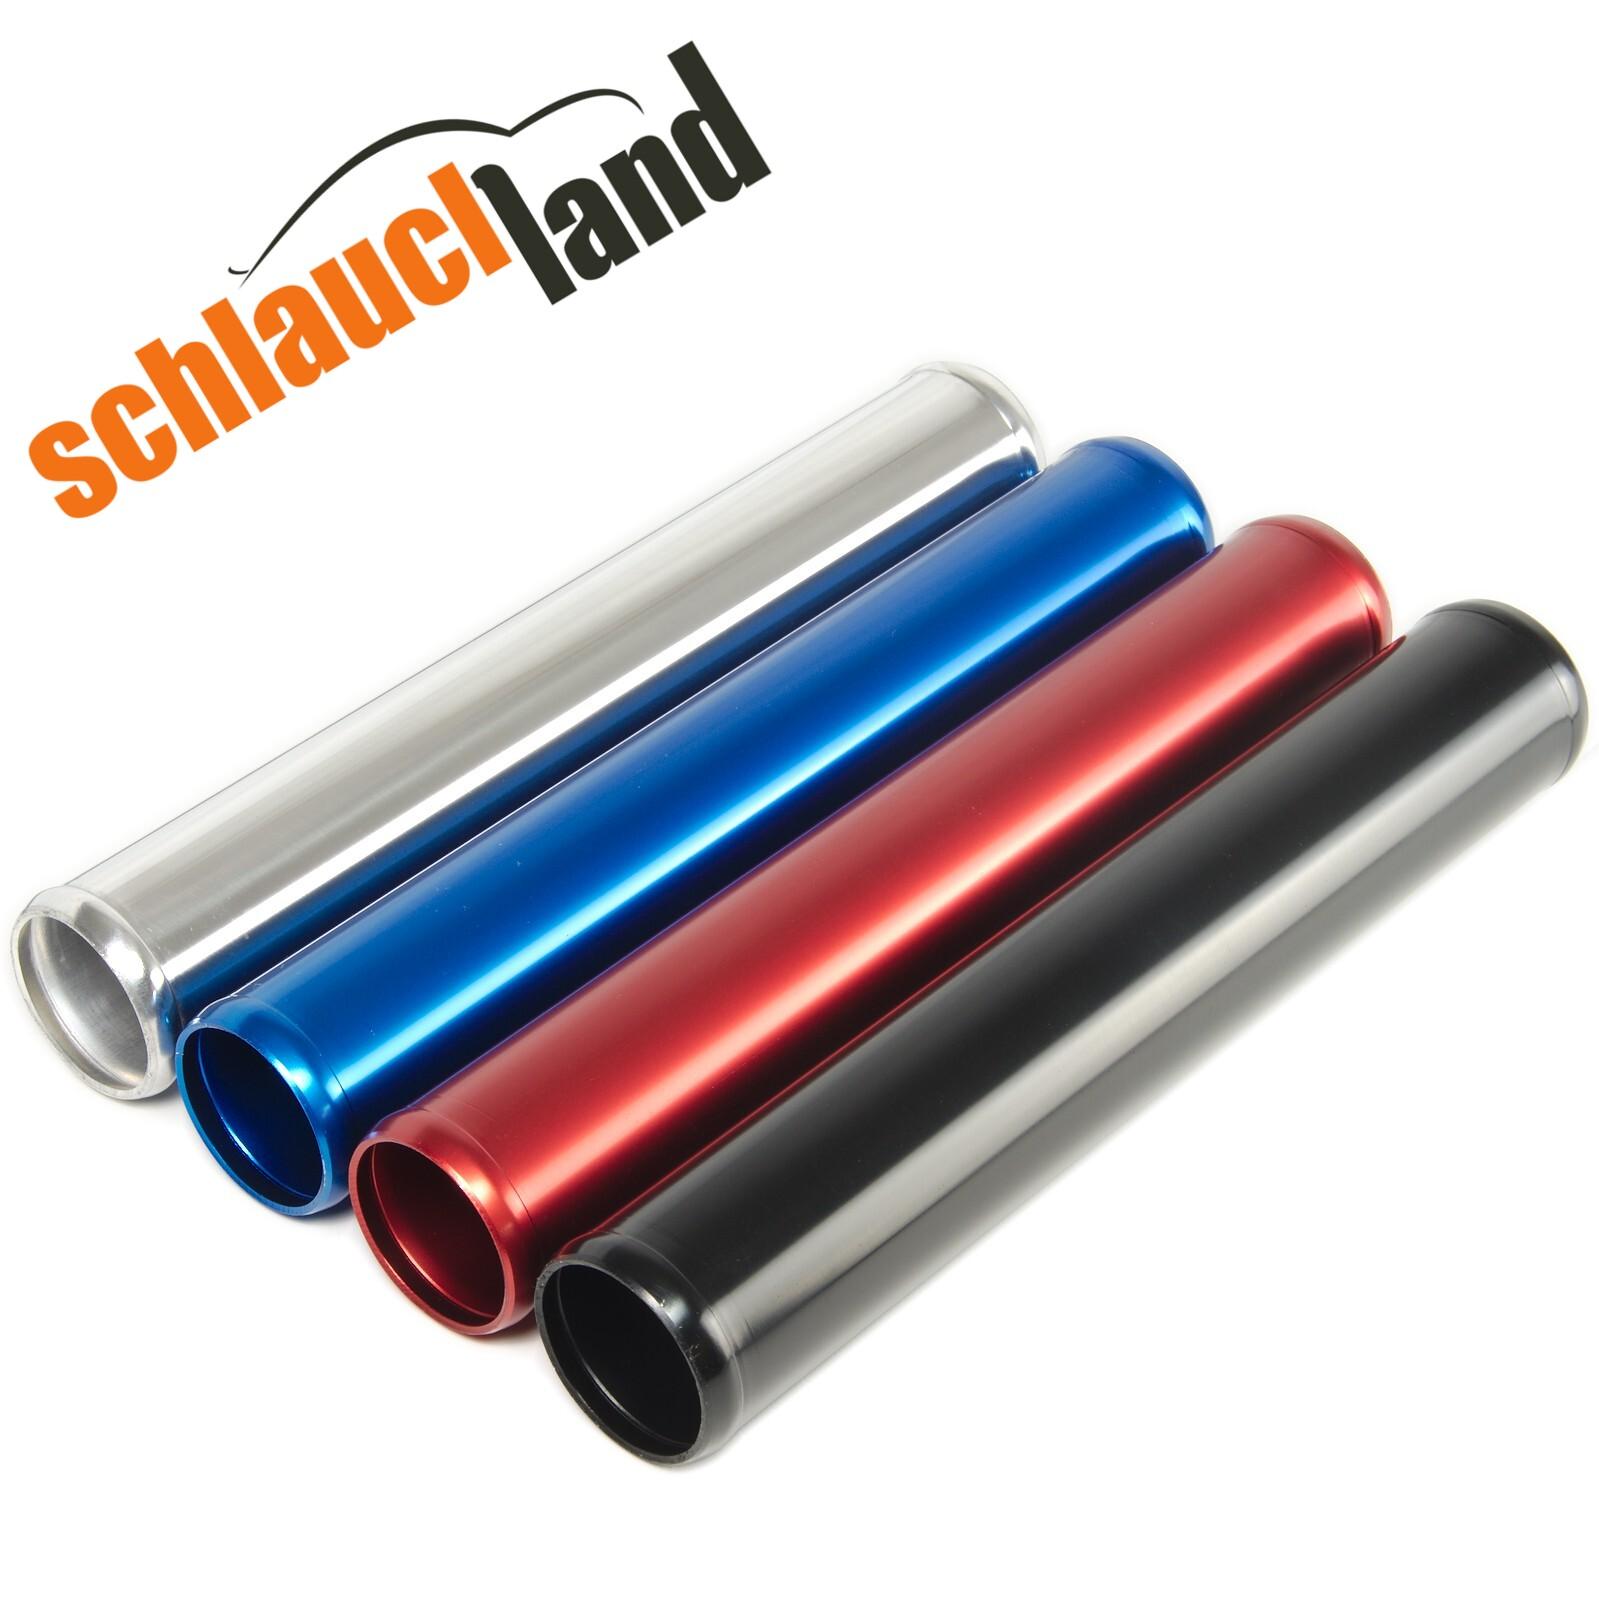 Alu-Rohr 30cm AD 41mm schwarz*** Alurohr Aluminium Rohr Schlauchverbinder Turbo